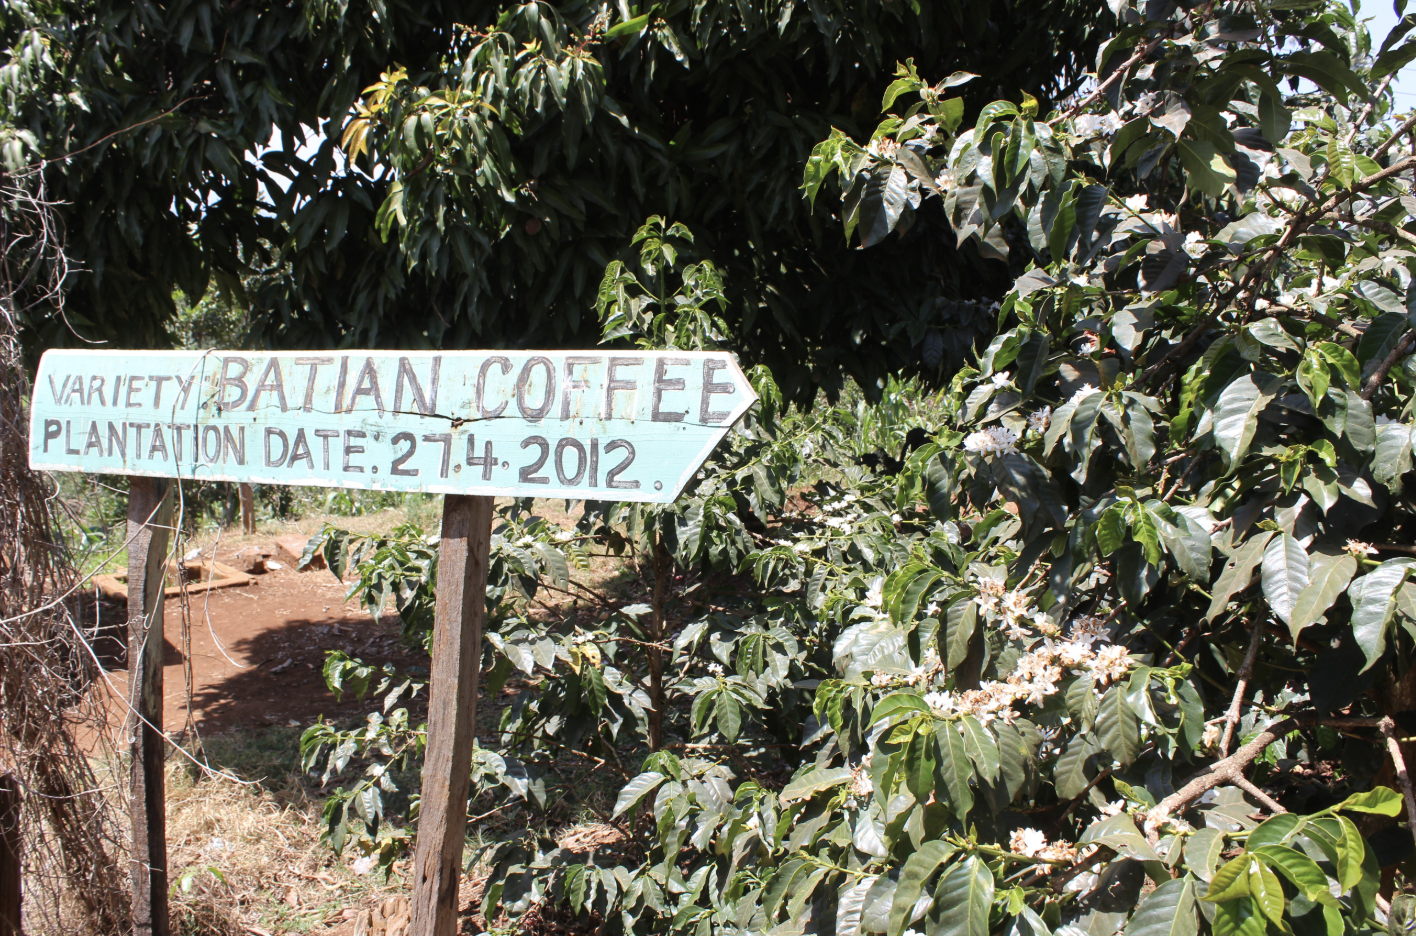 Batian Coffee Variety at Gathaithi